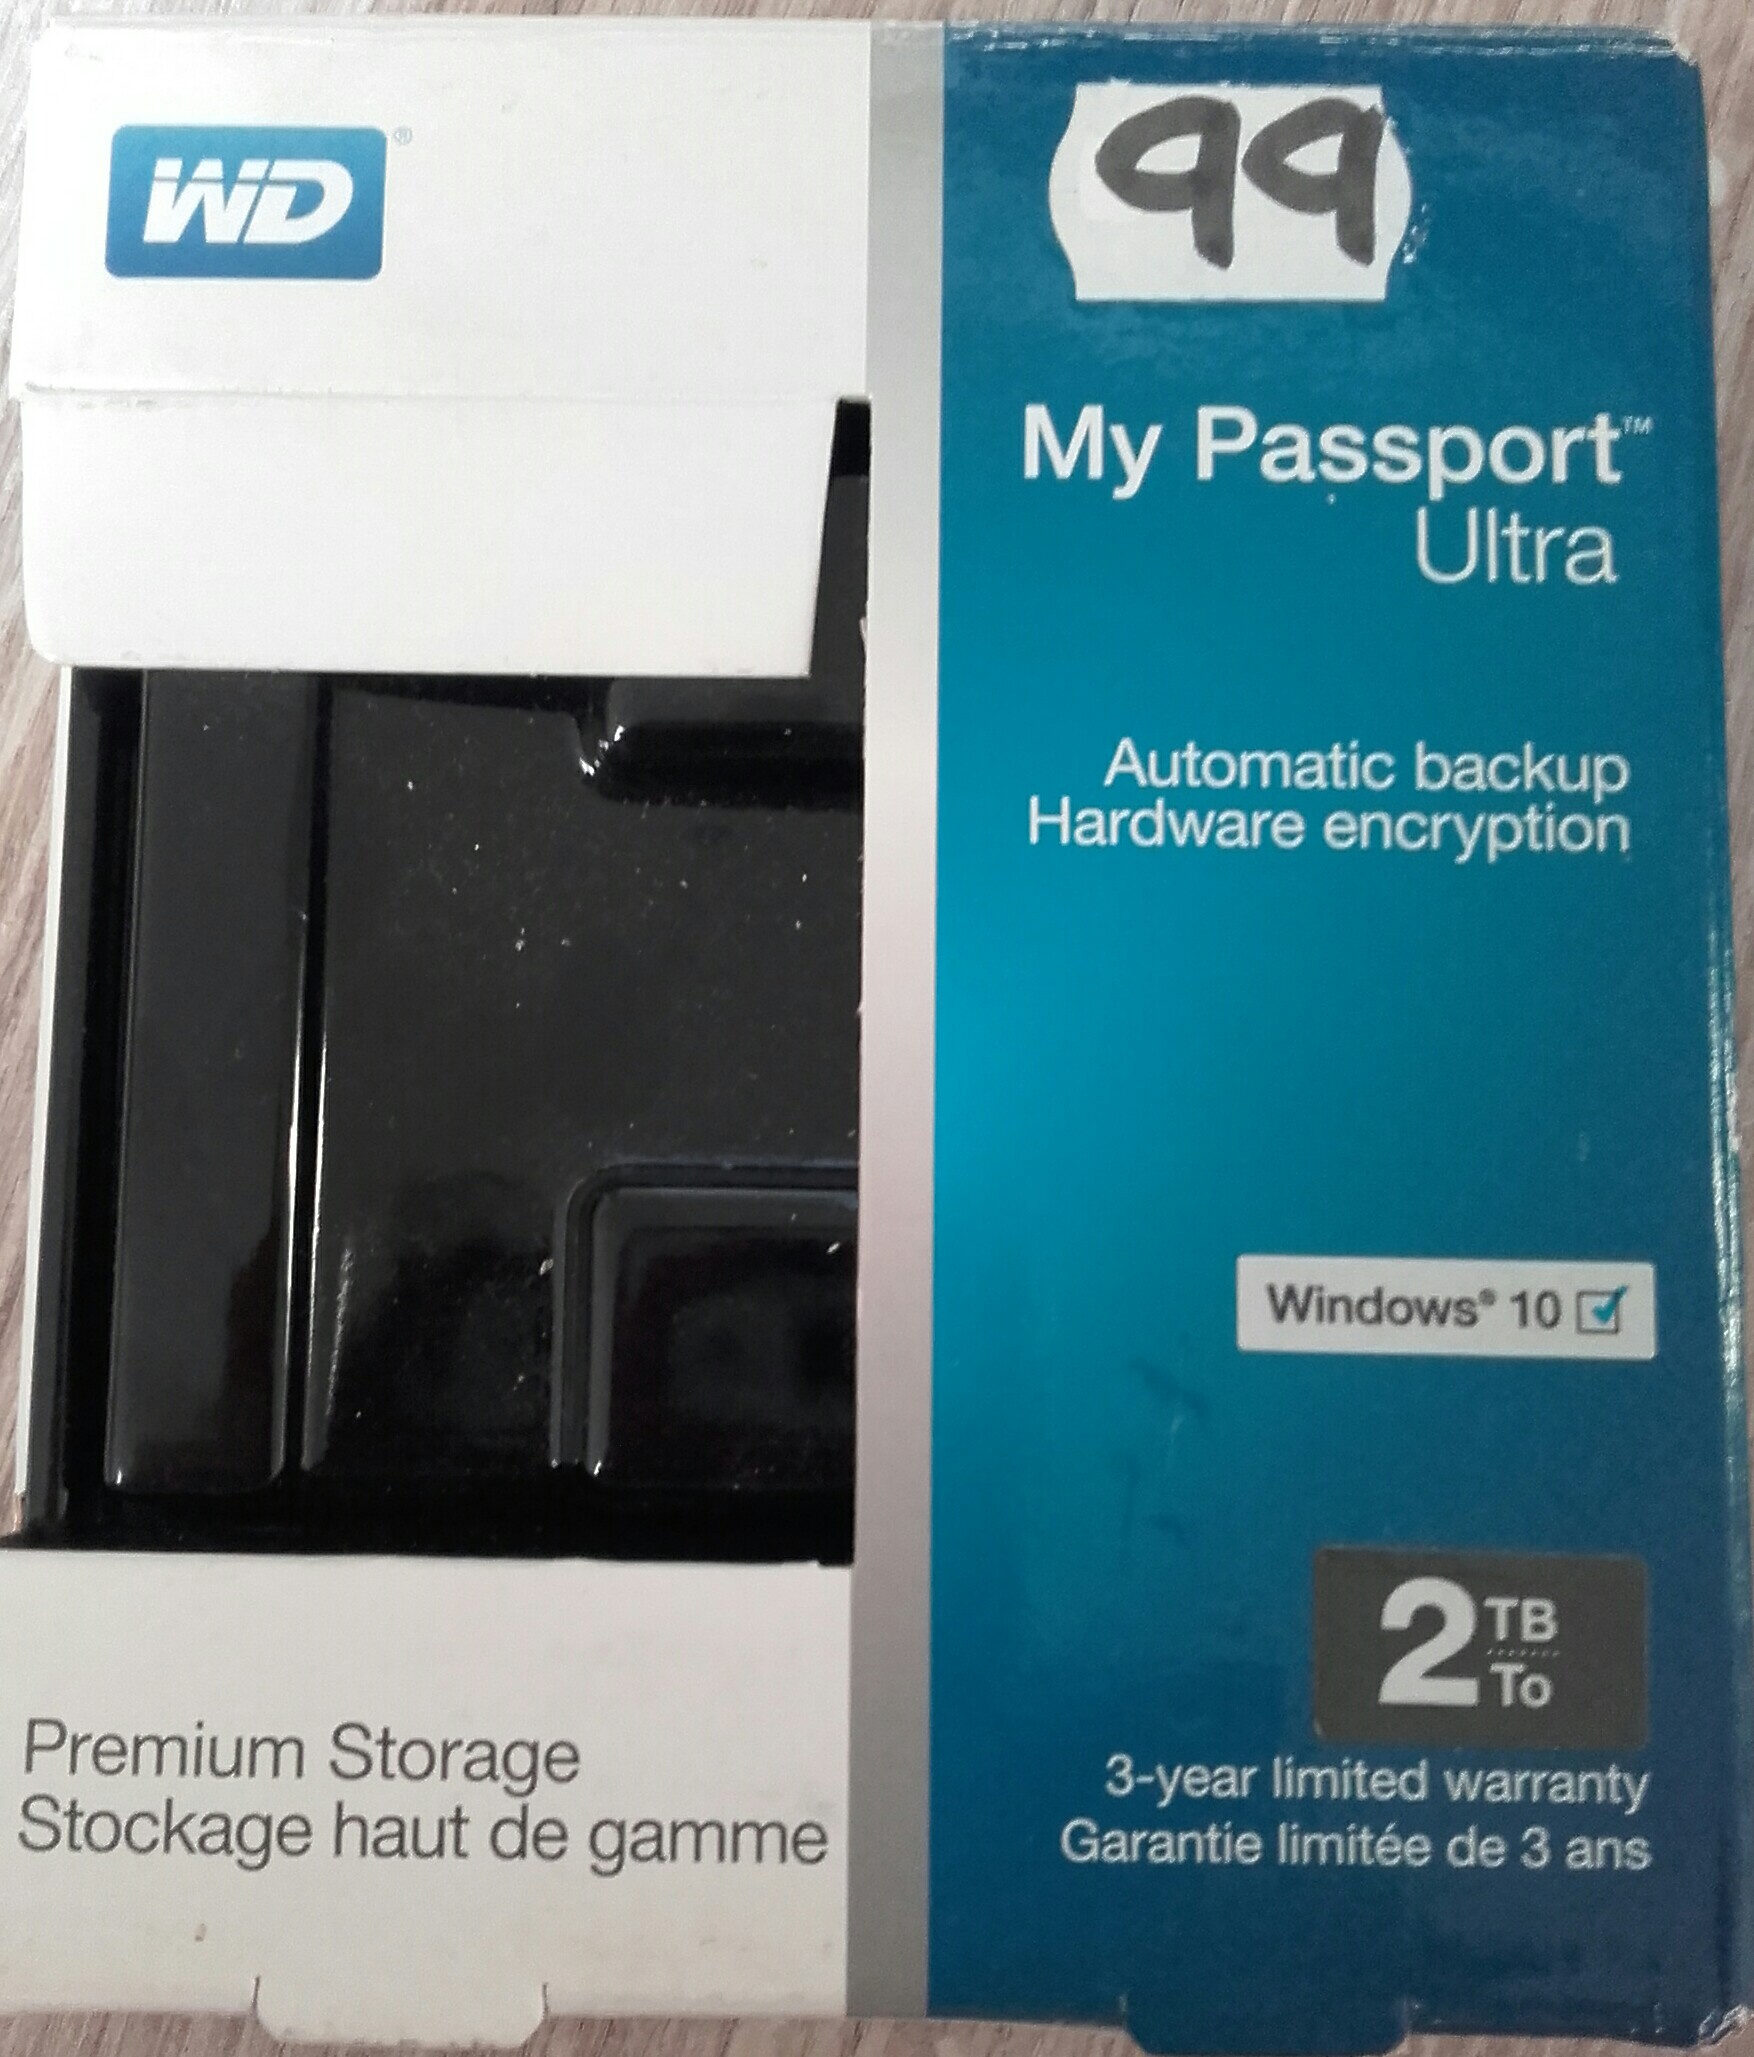 My  Passport Ultra - Product